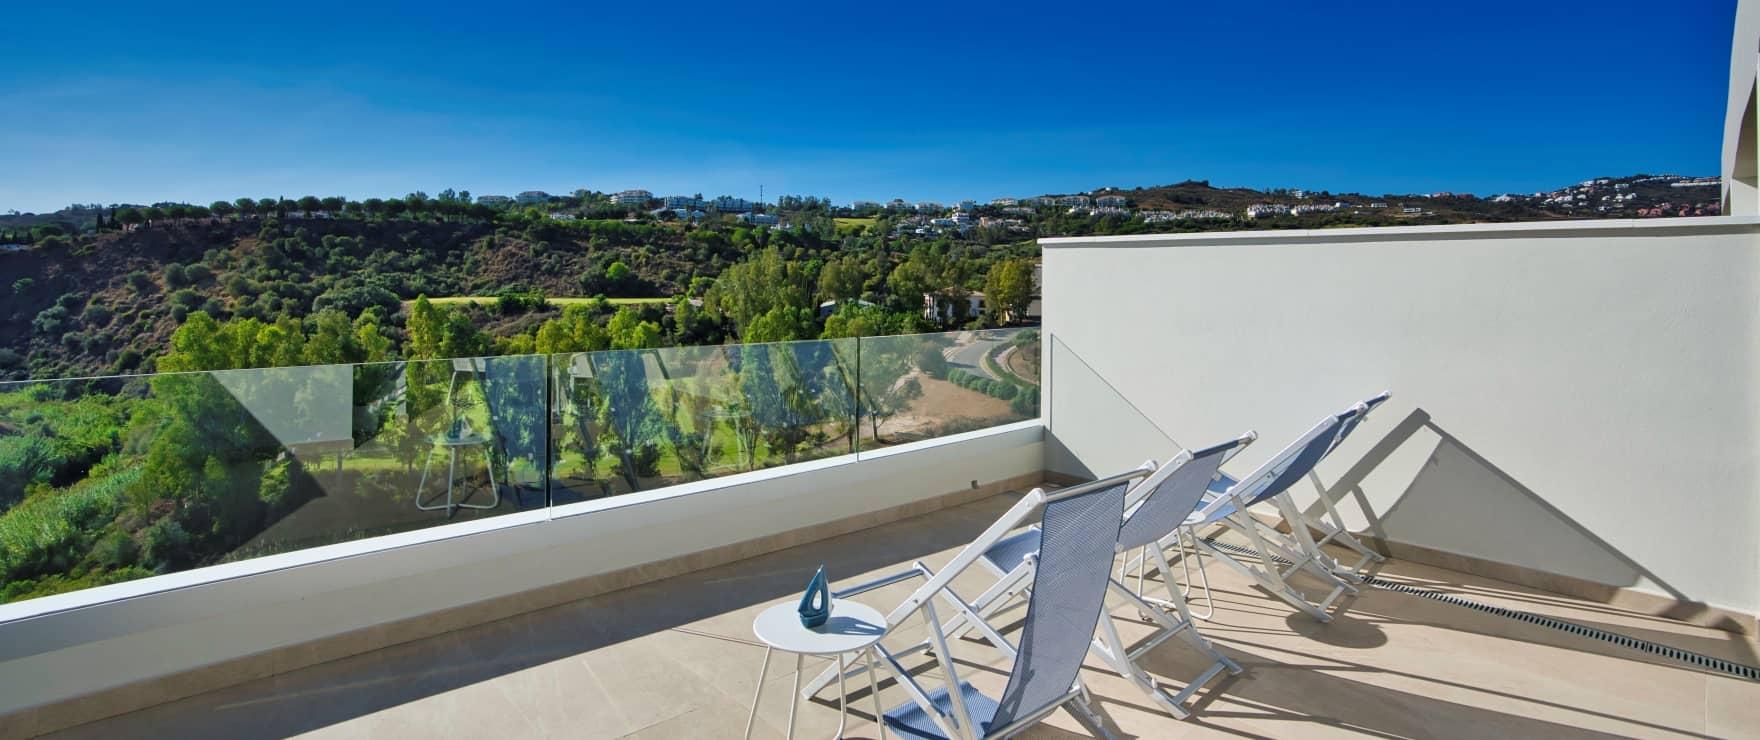 Natura – La Cala Golf Resort, Mijas (Malaga)